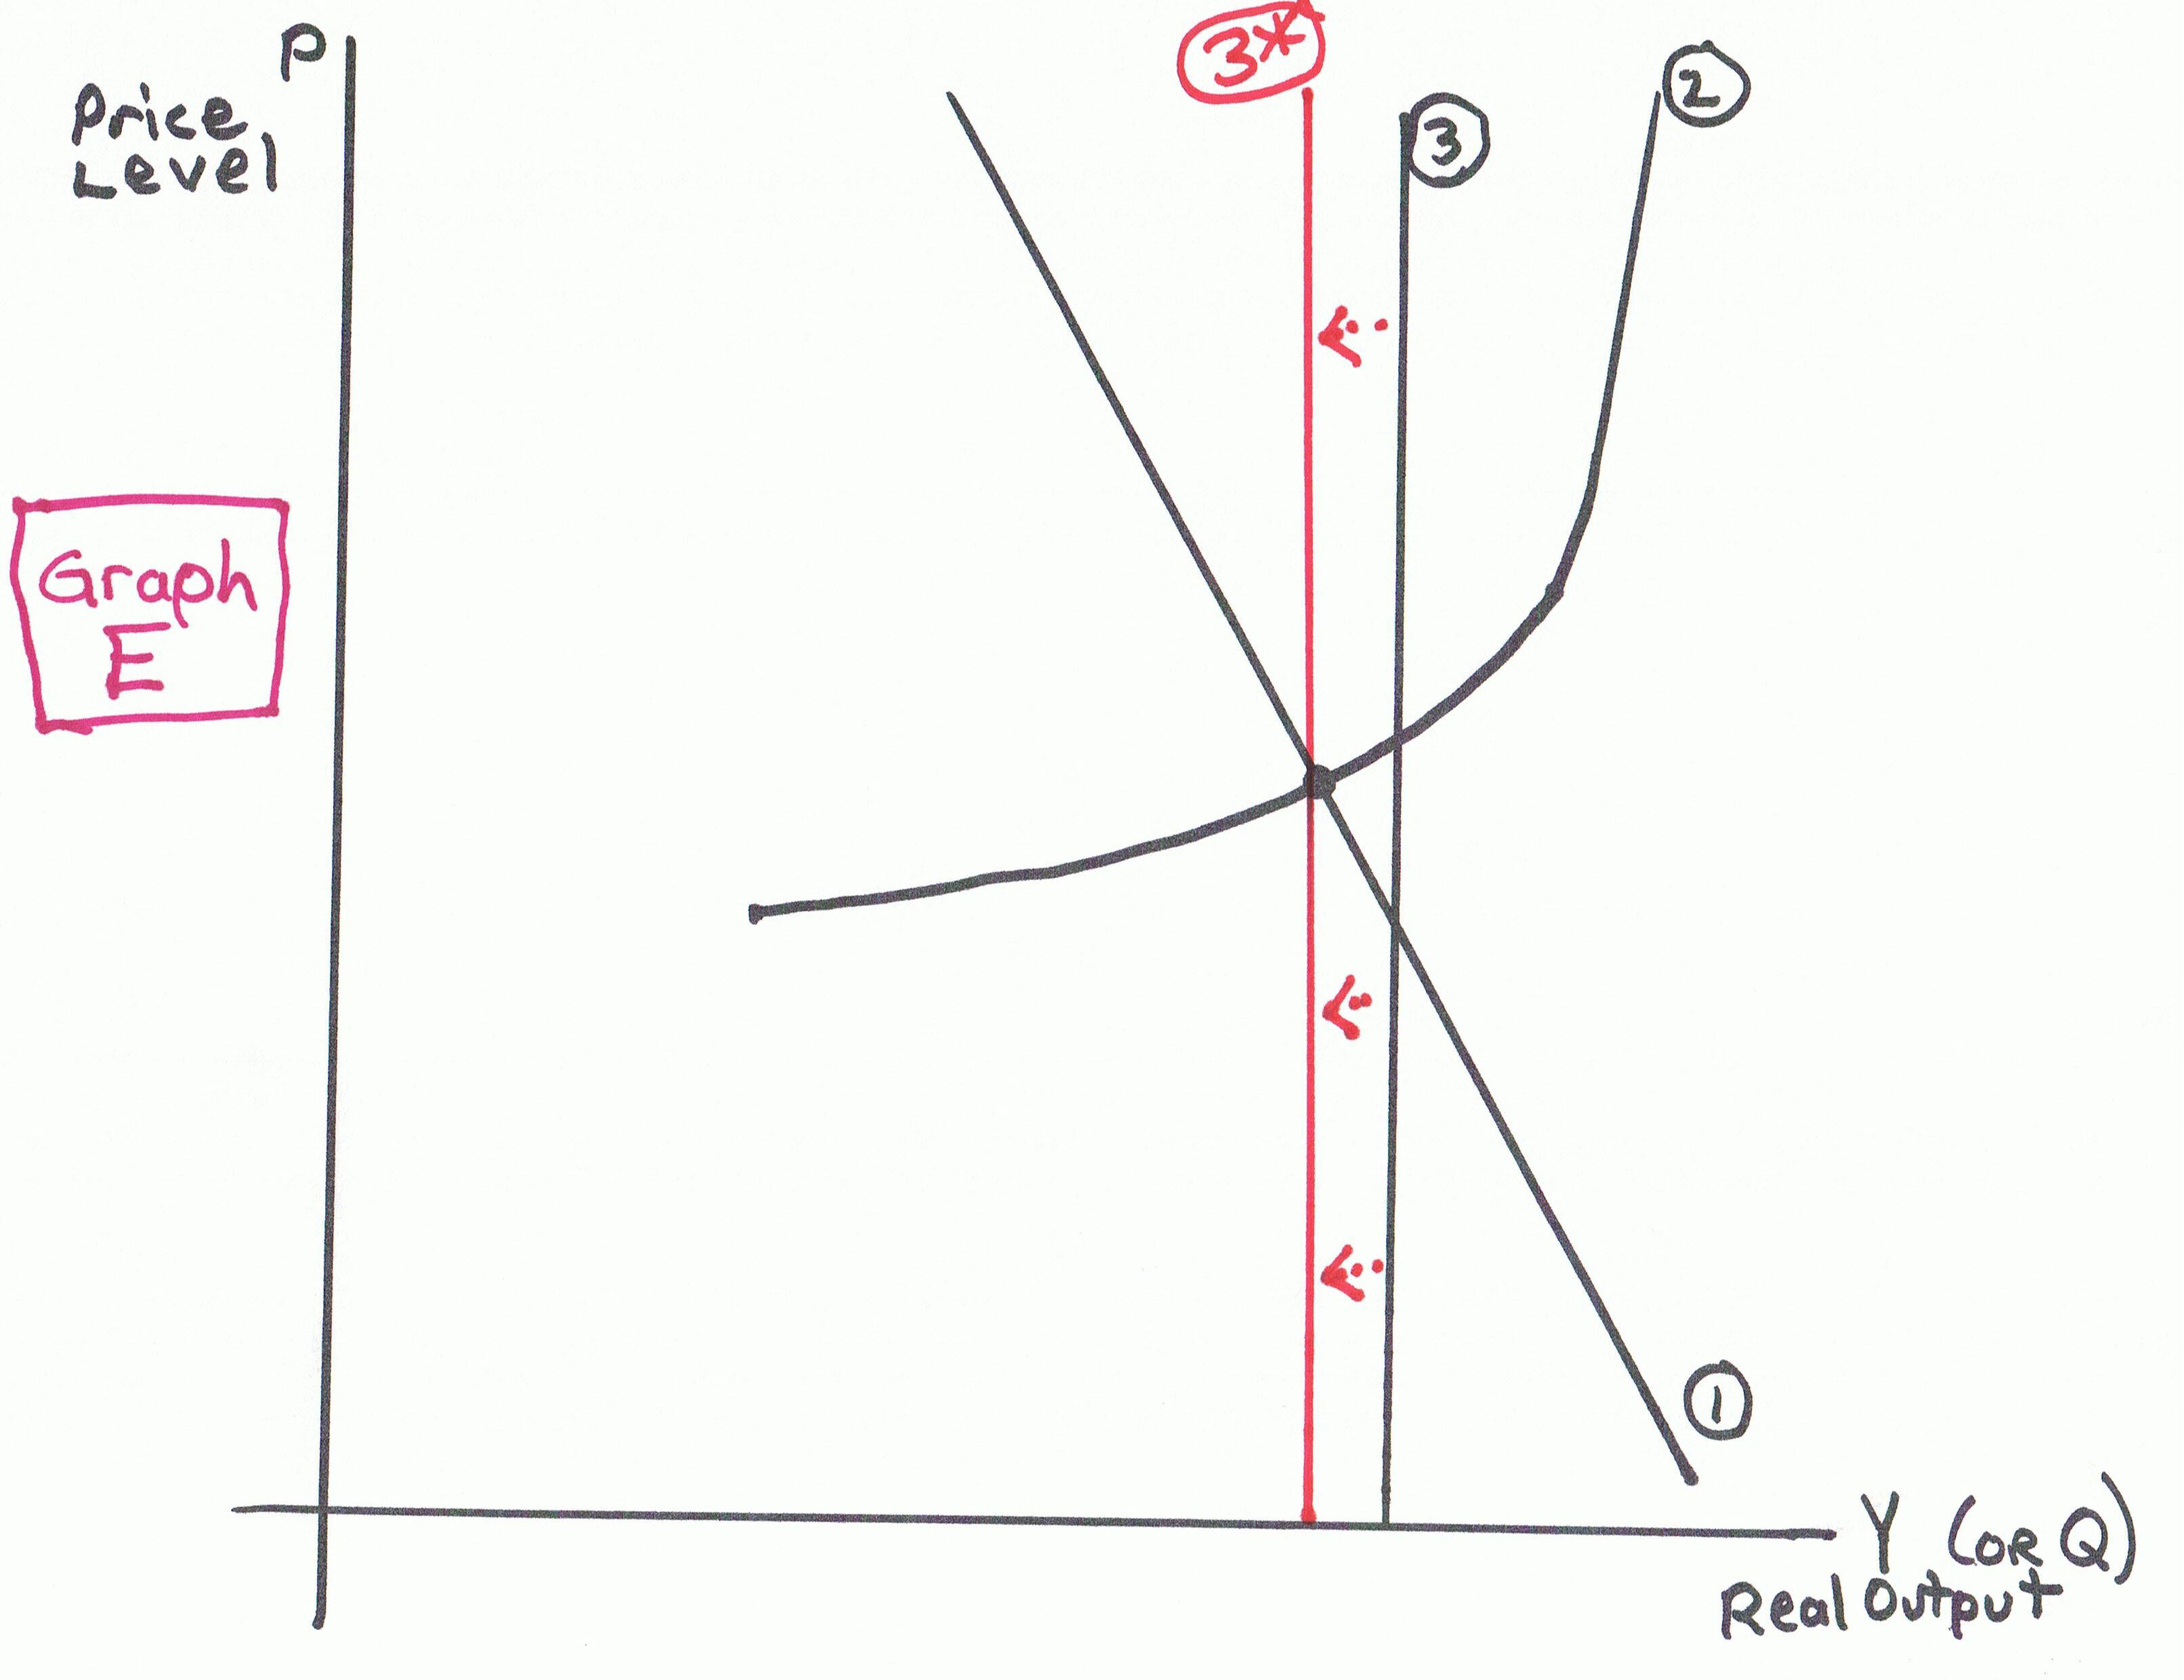 Graph E Macro Worksheet Ad As Econproph On Macro